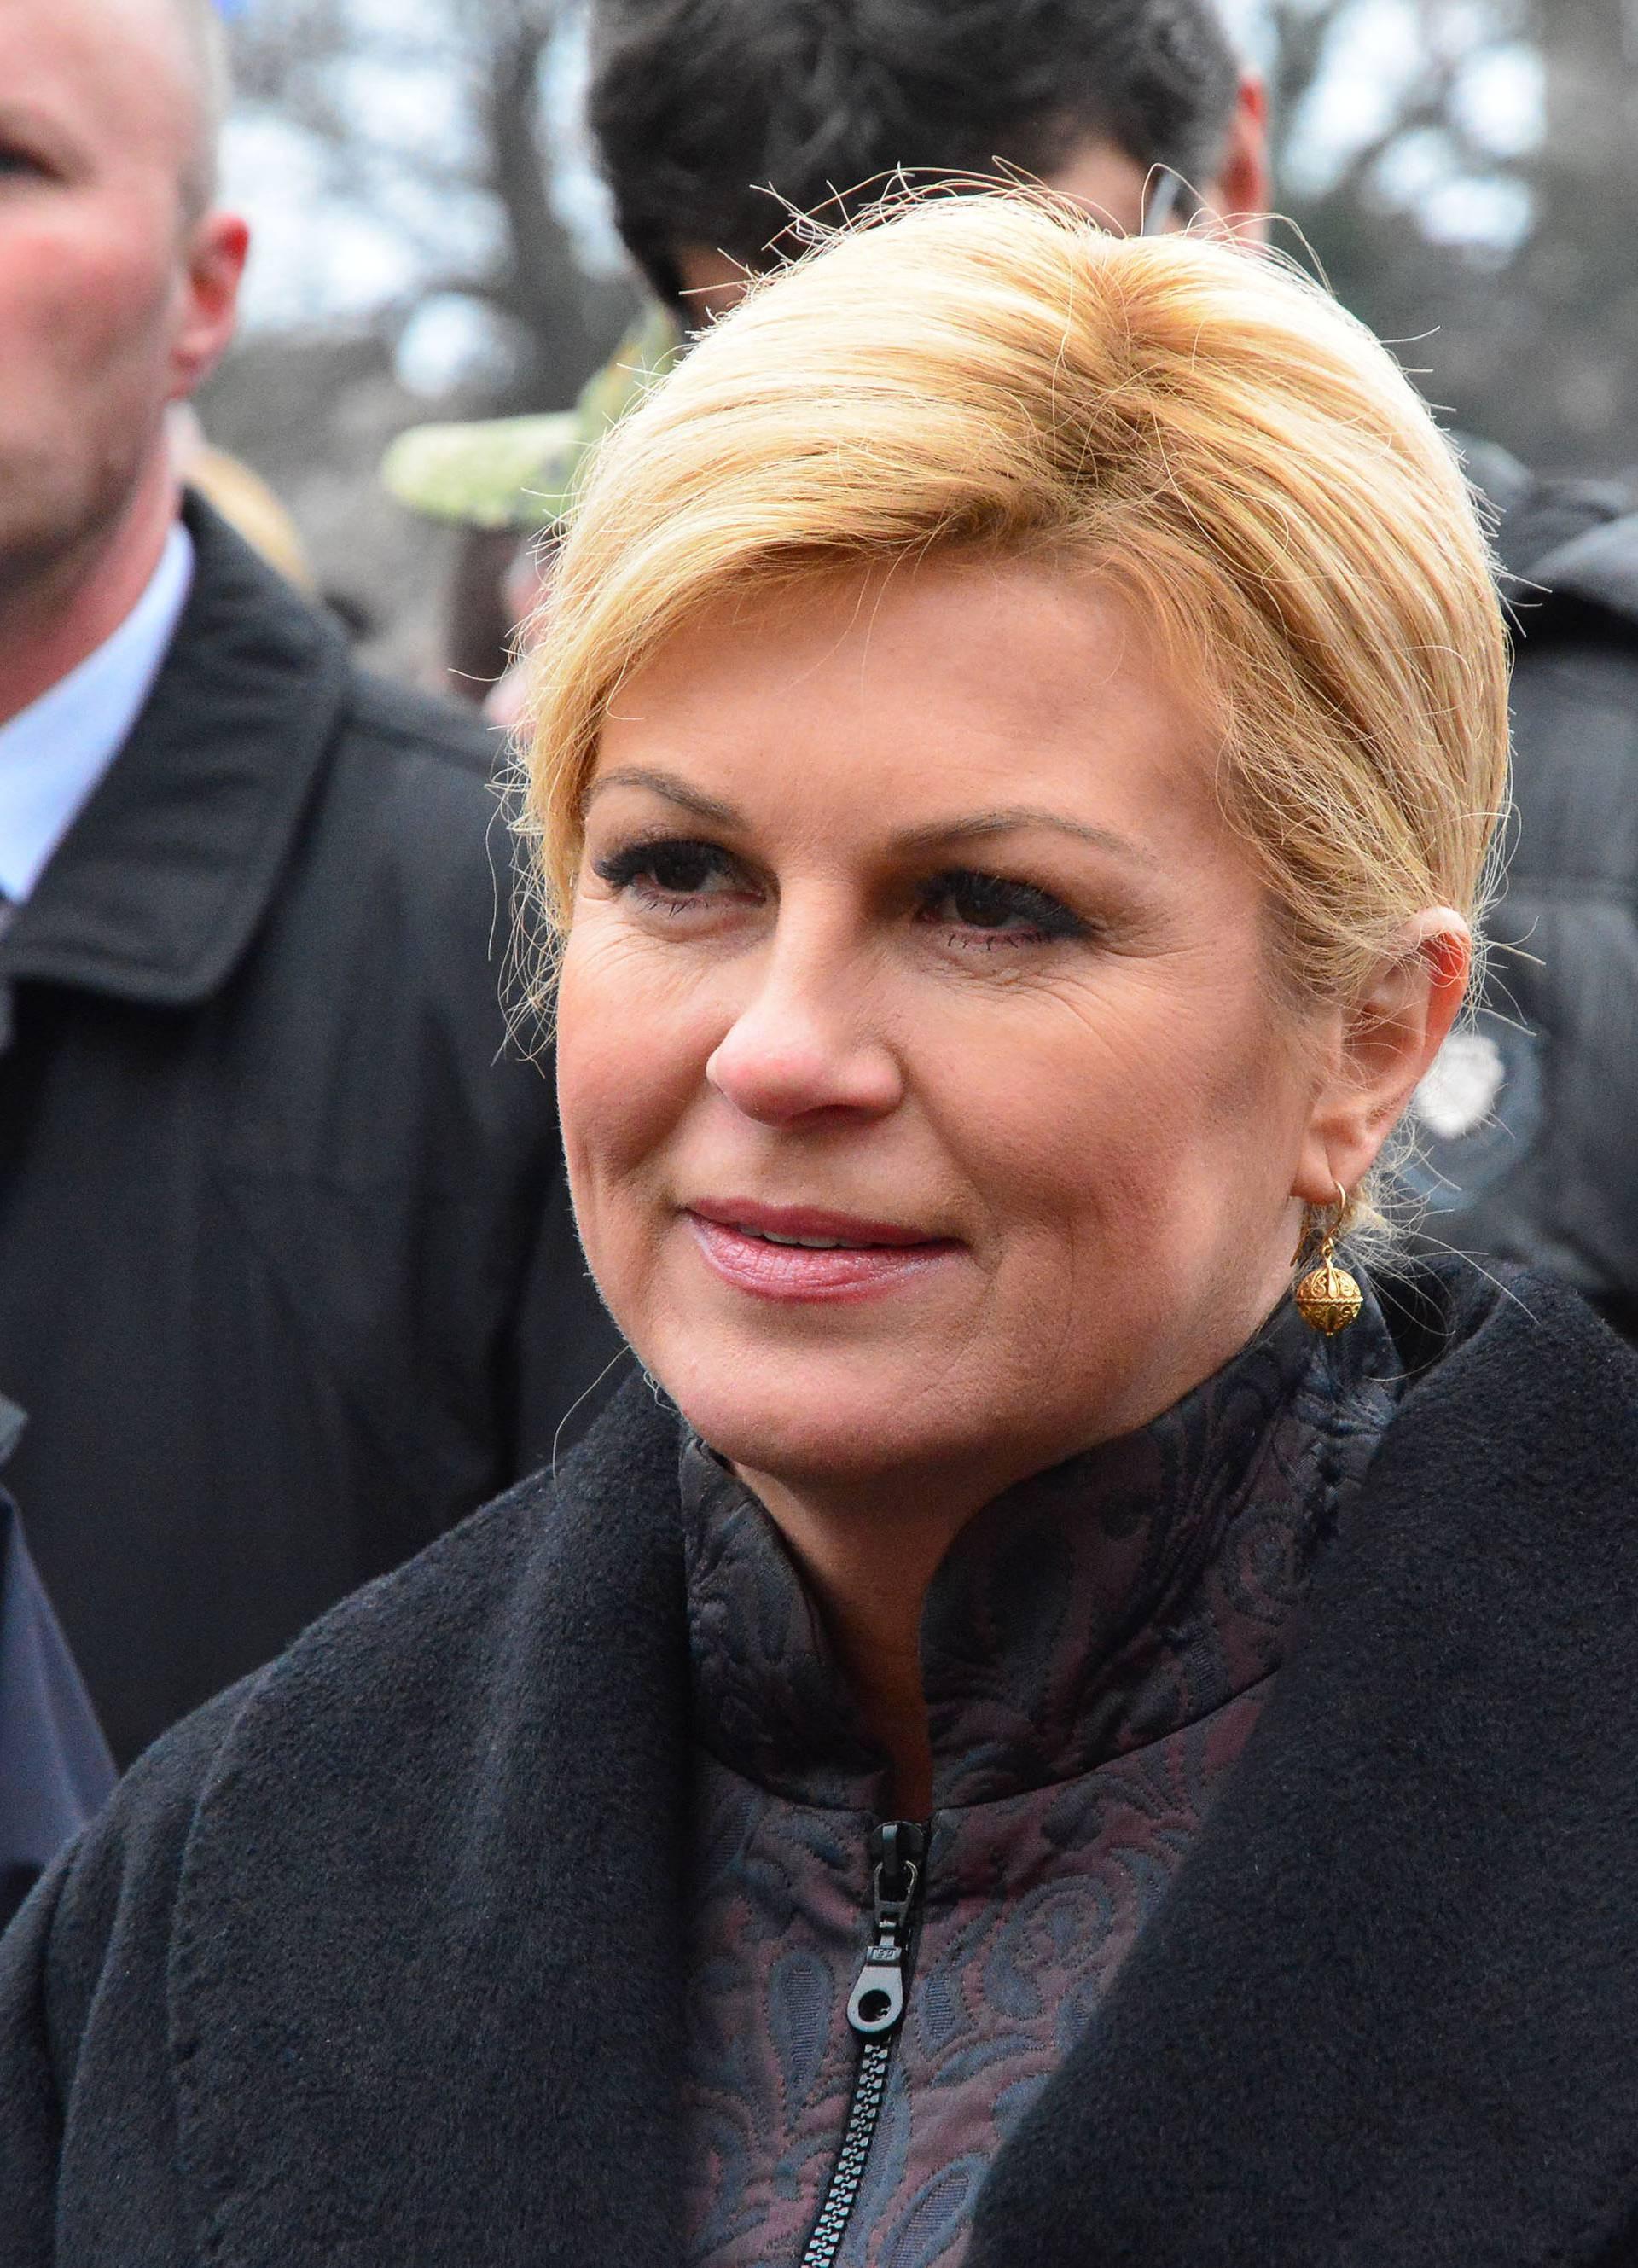 Kolinda Grabar Kitarović potiče netrpeljivost i predrasude